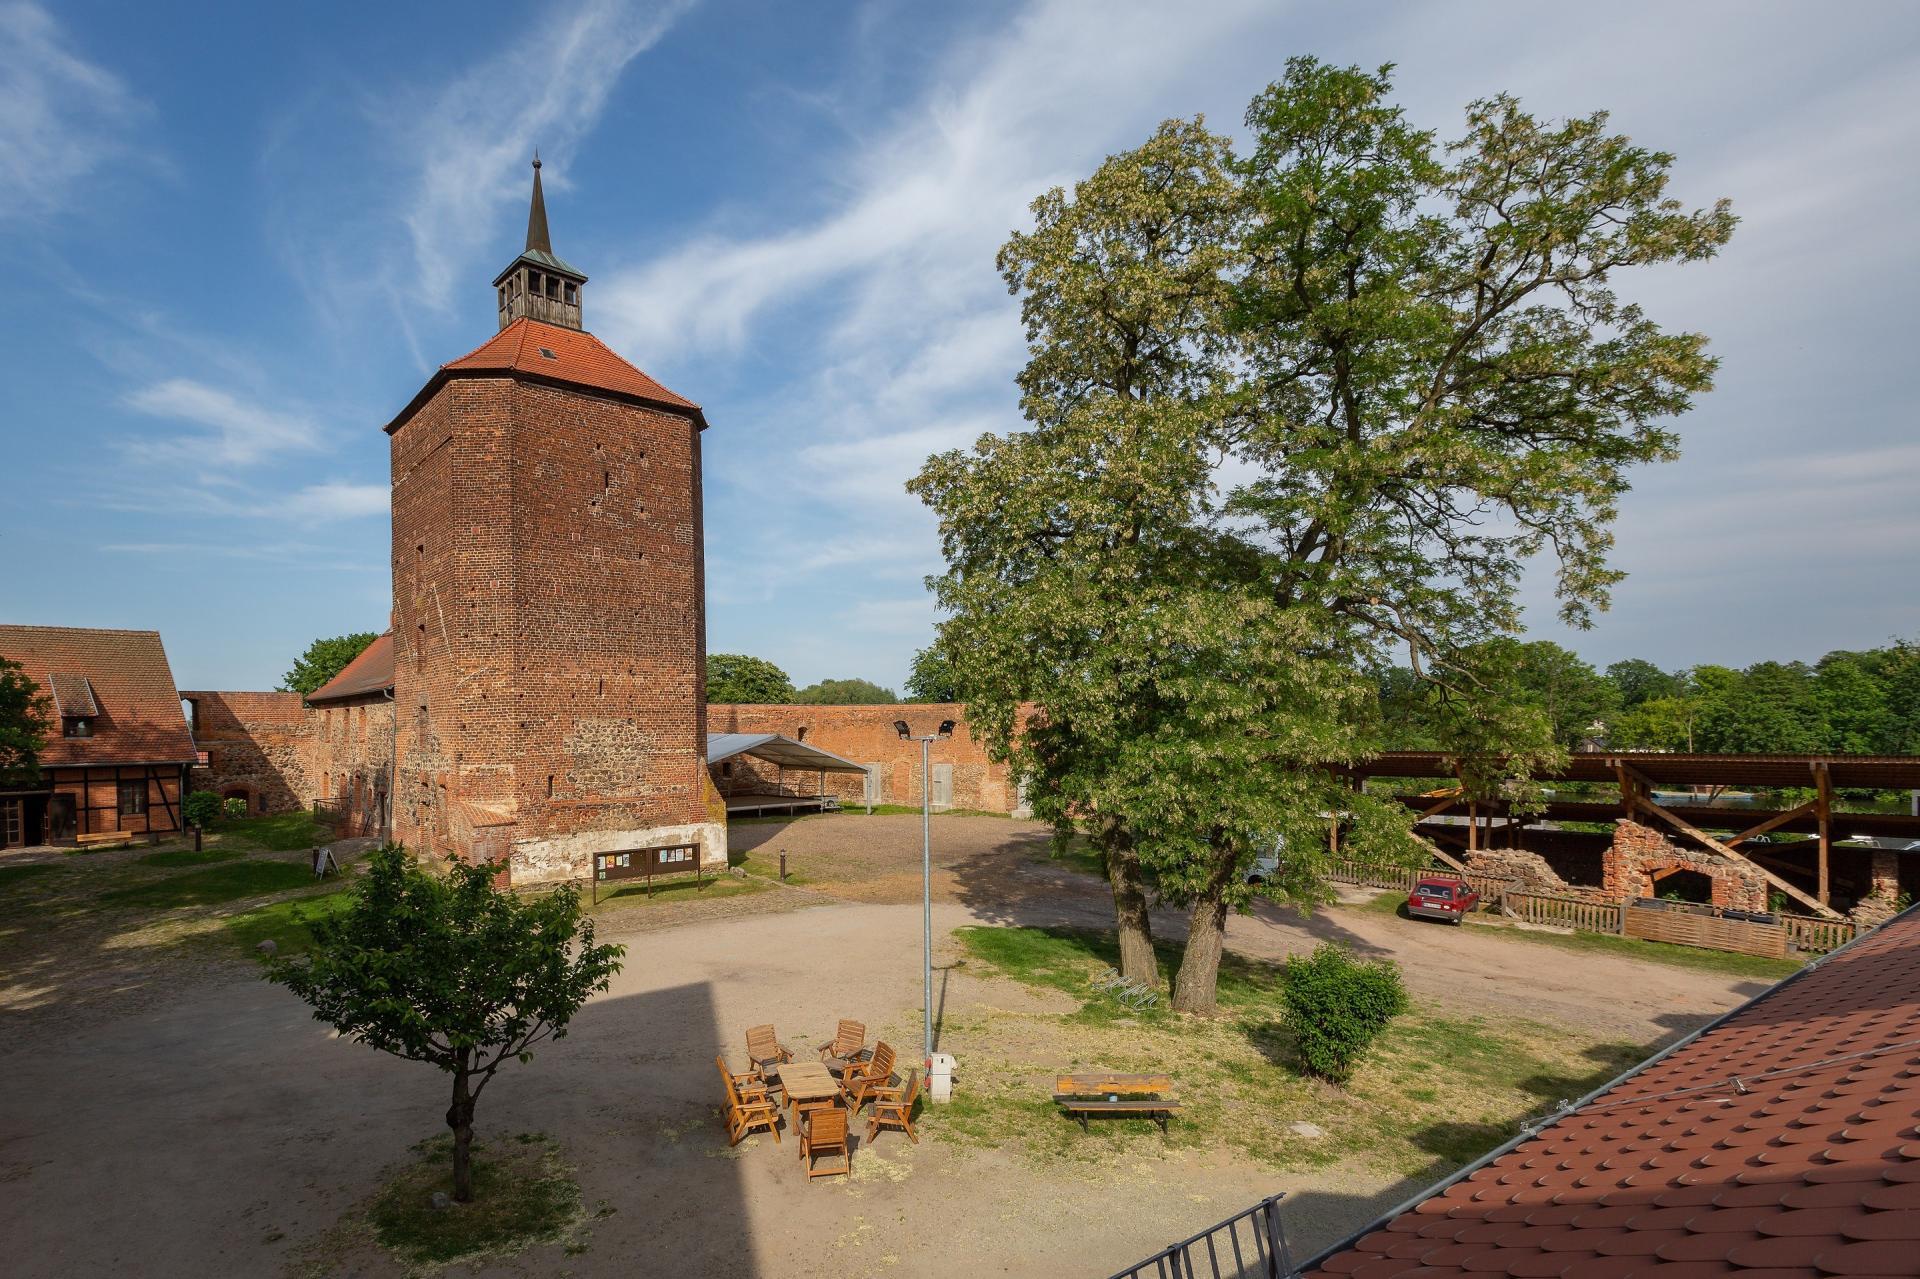 Burghof Burg Beeskow